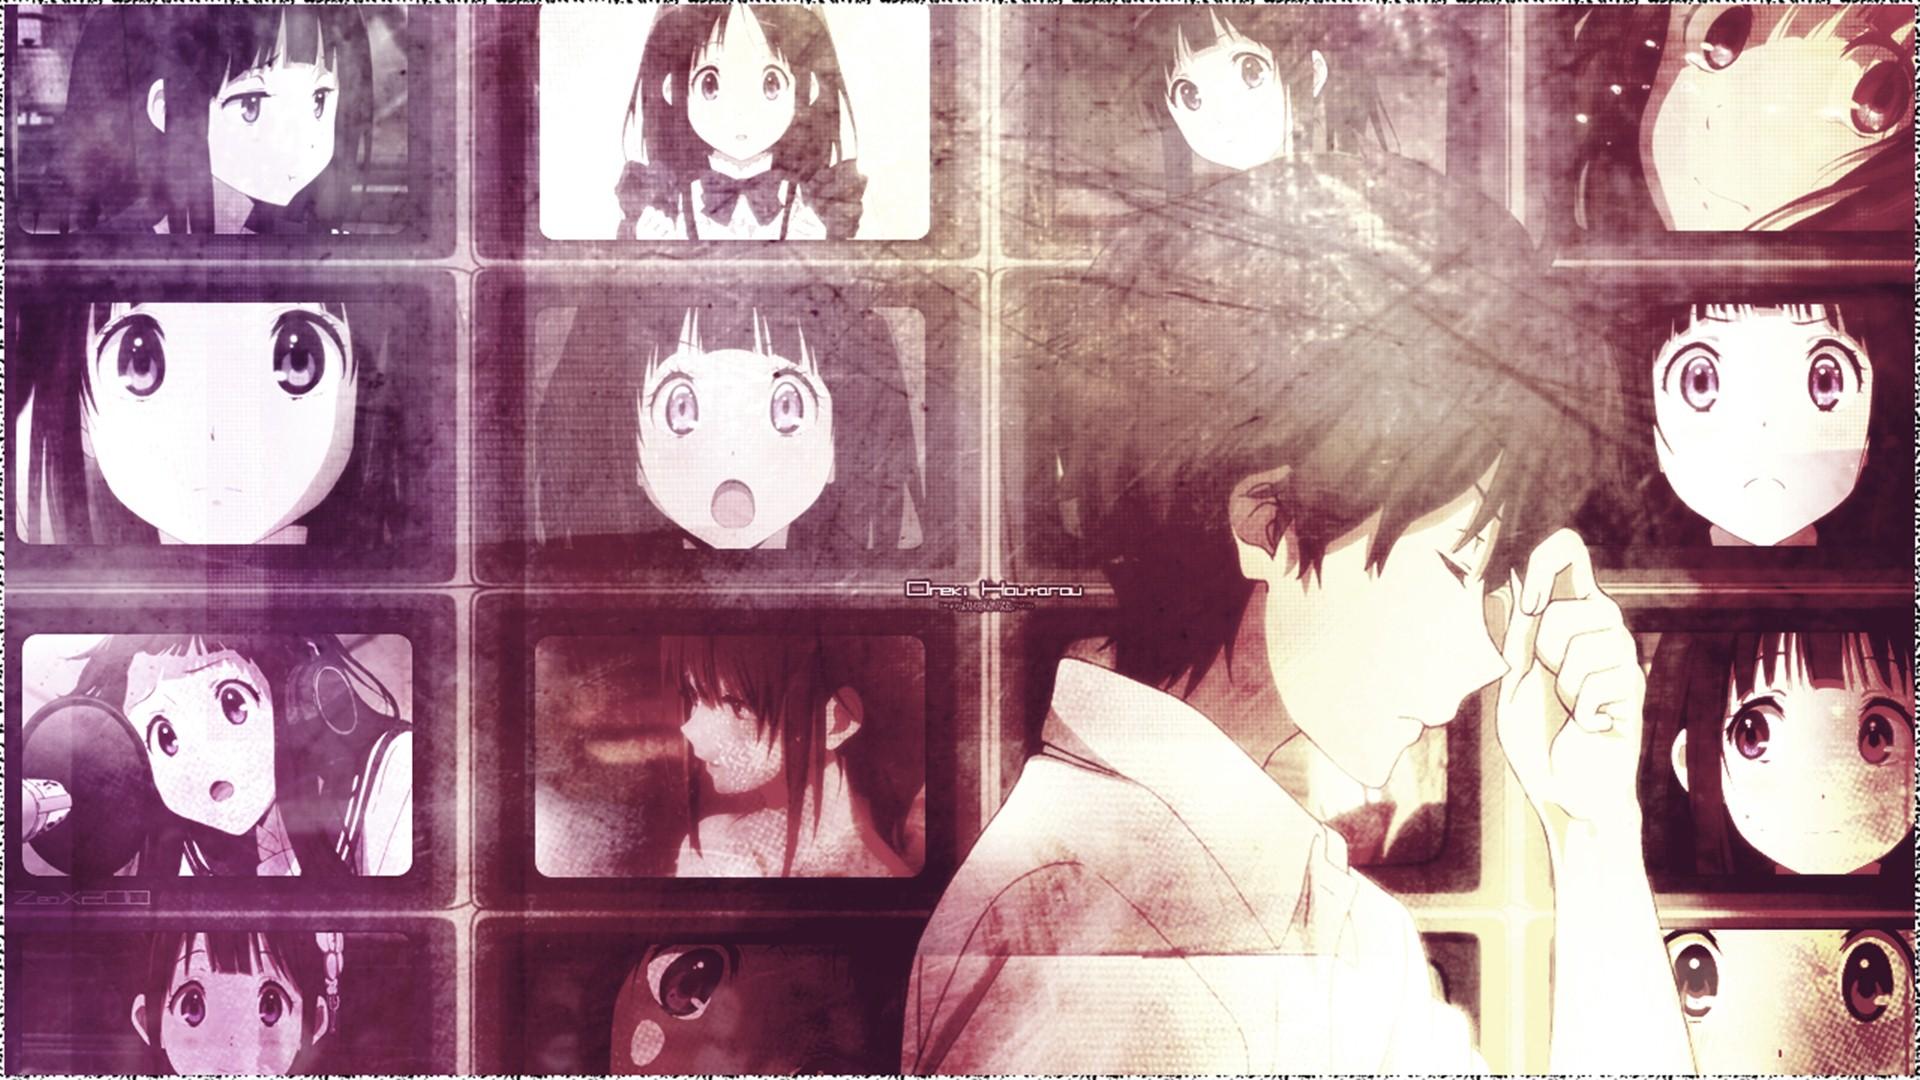 Houtarou Oreki And Eru Chitanda Hq Desktop Wallpaper Hyouka Quotes 1920x1080 Wallpaper Teahub Io